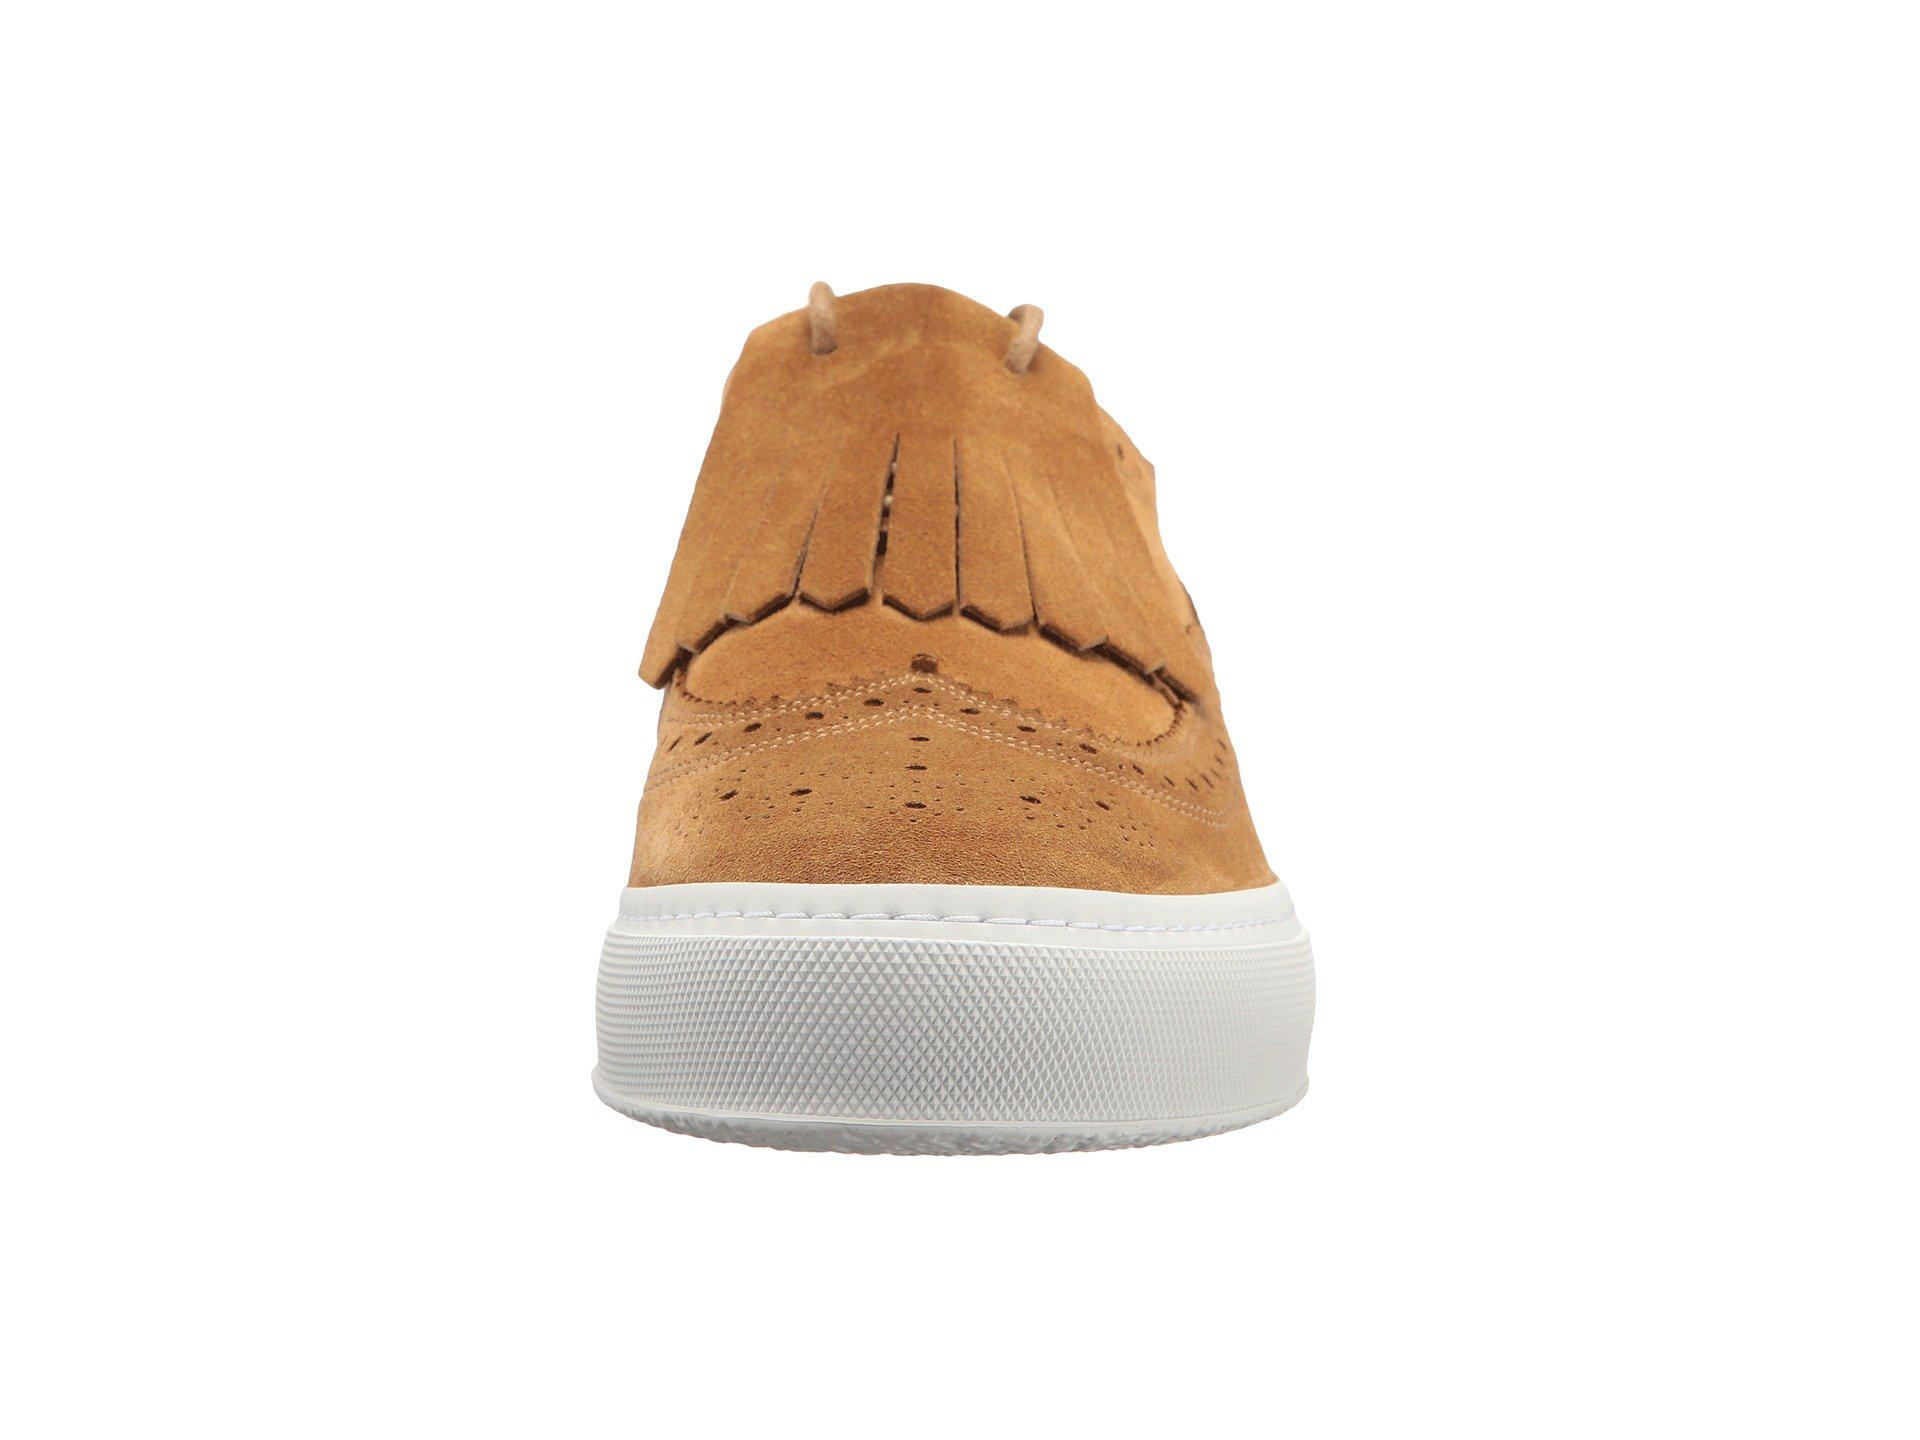 Tolka01N Kiltie Sneaker Clergerie I2RMWk